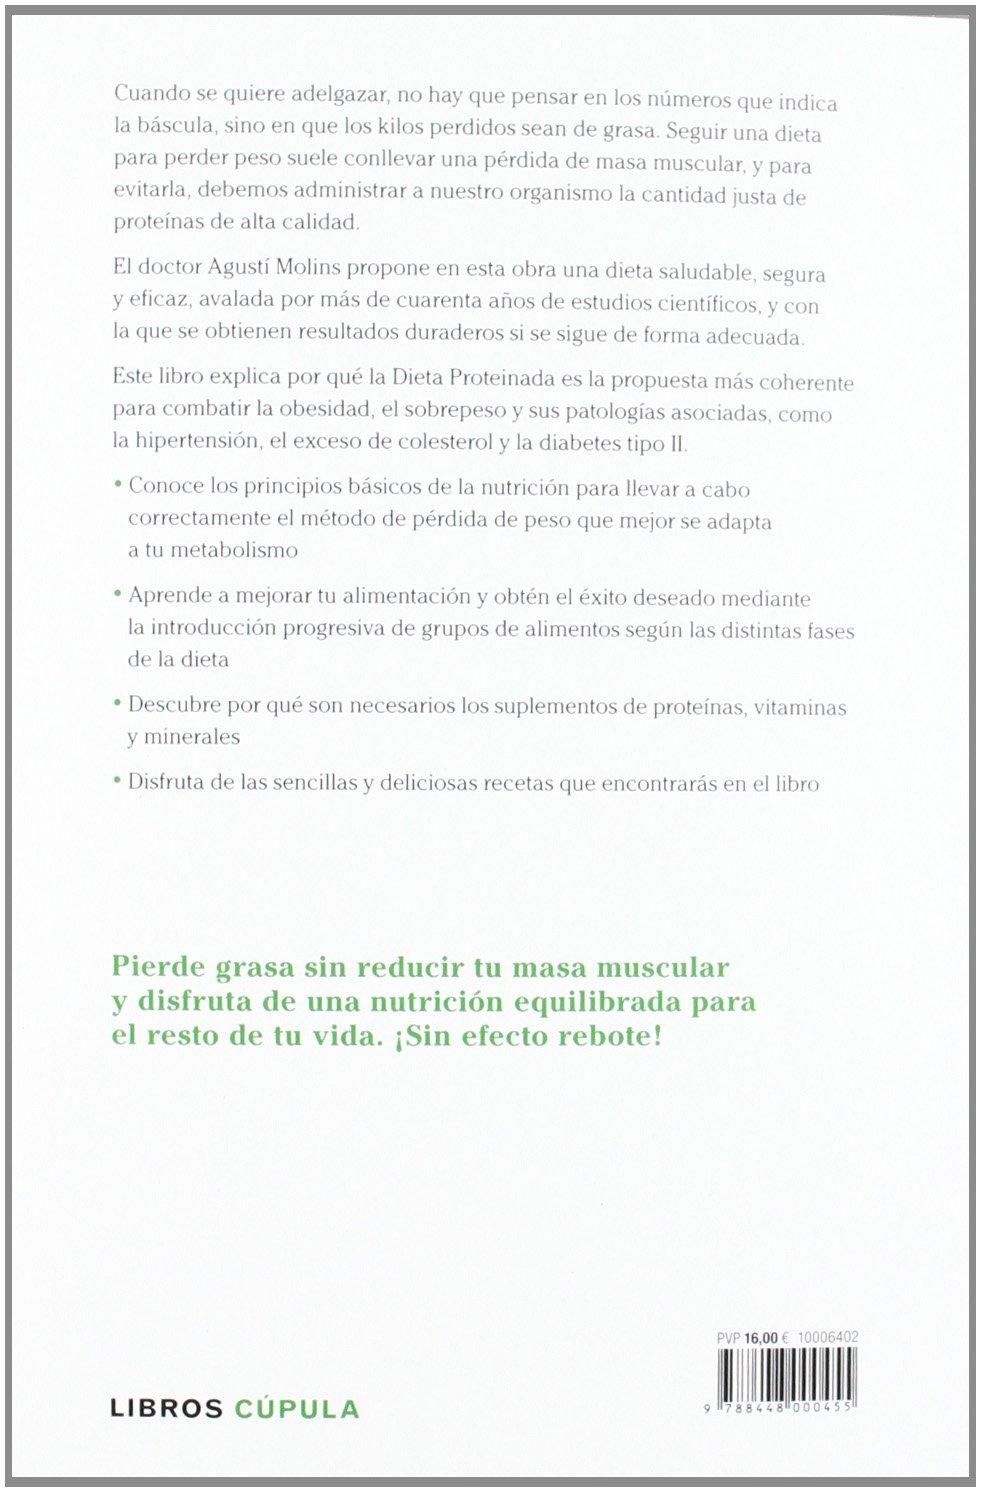 La Dieta Proteinada: Agustí Molins Olmos: 9788448000455: Amazon.com: Books